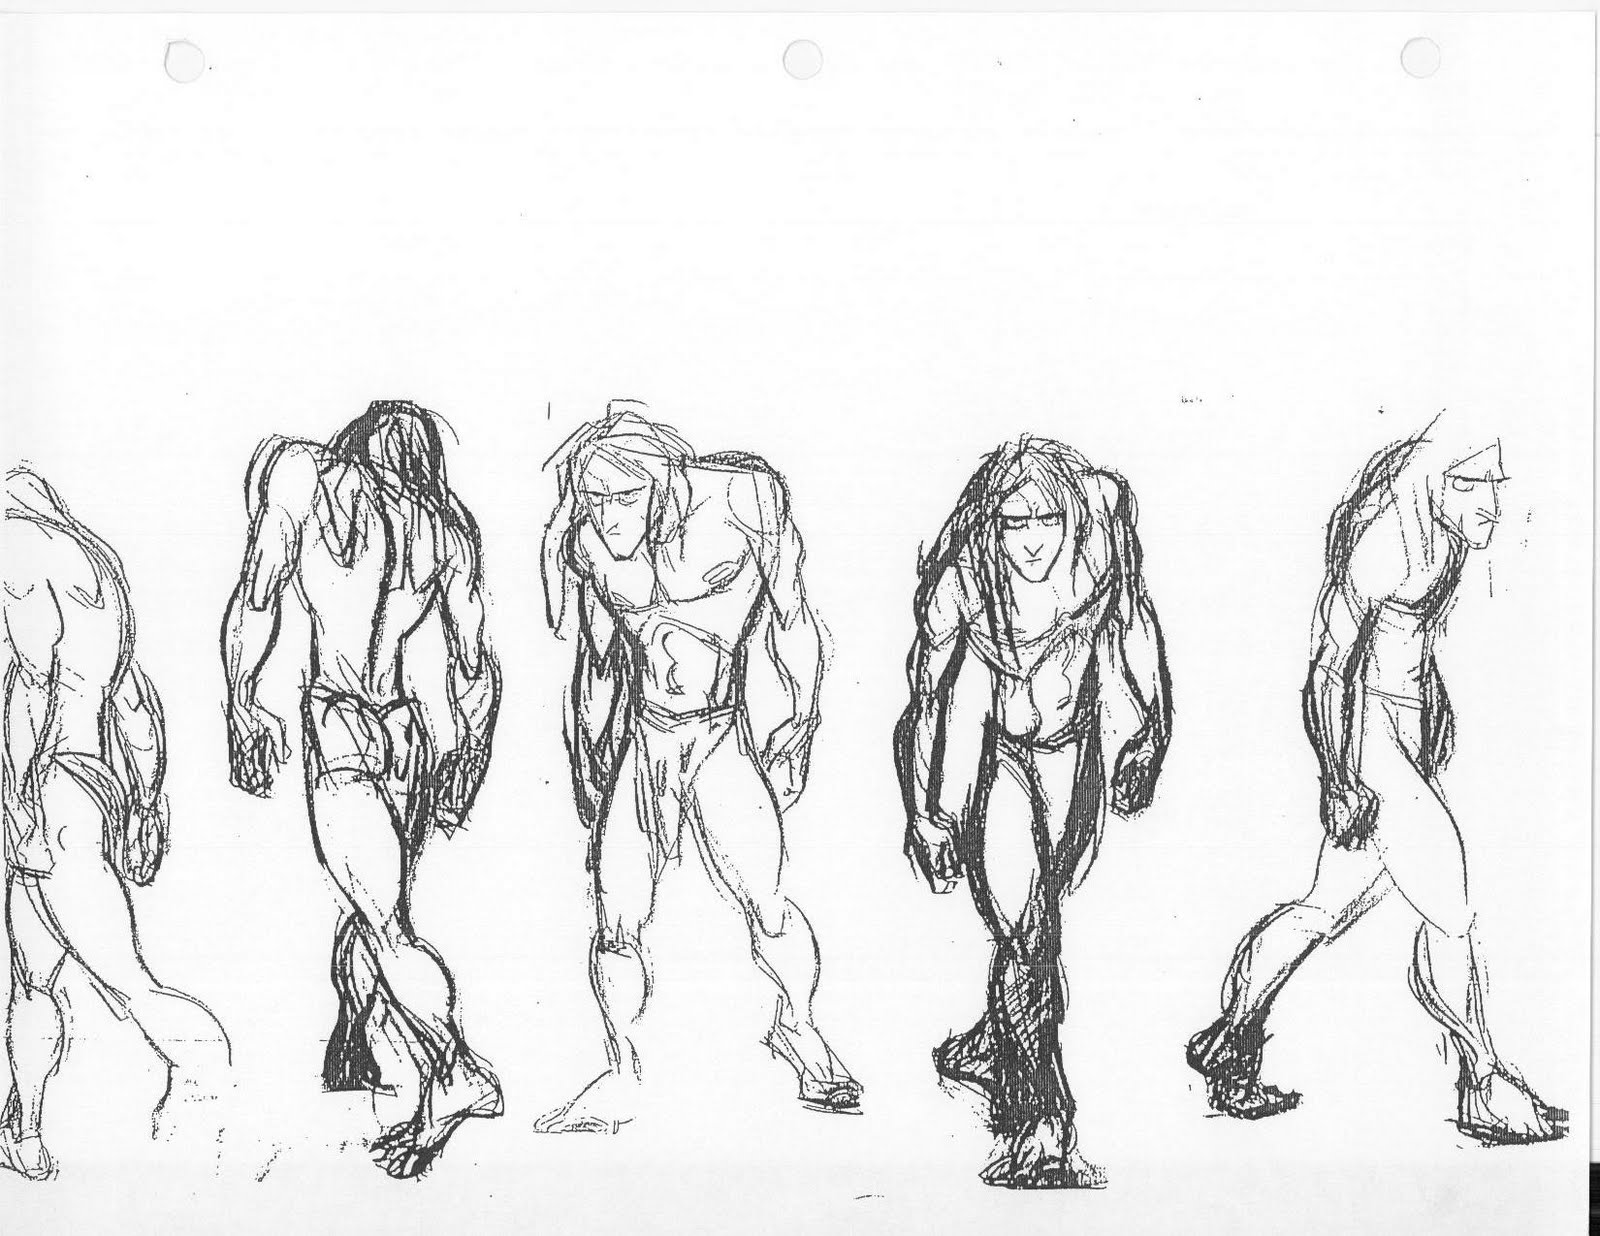 http://2.bp.blogspot.com/-5VVuAwedkUg/TqW6sUqcV5I/AAAAAAAAADg/RVcClHeR2Rs/s1600/Glenn+Keane%252C+Tarzan+Ruff+Turnaround%252C+Pencil.jpg